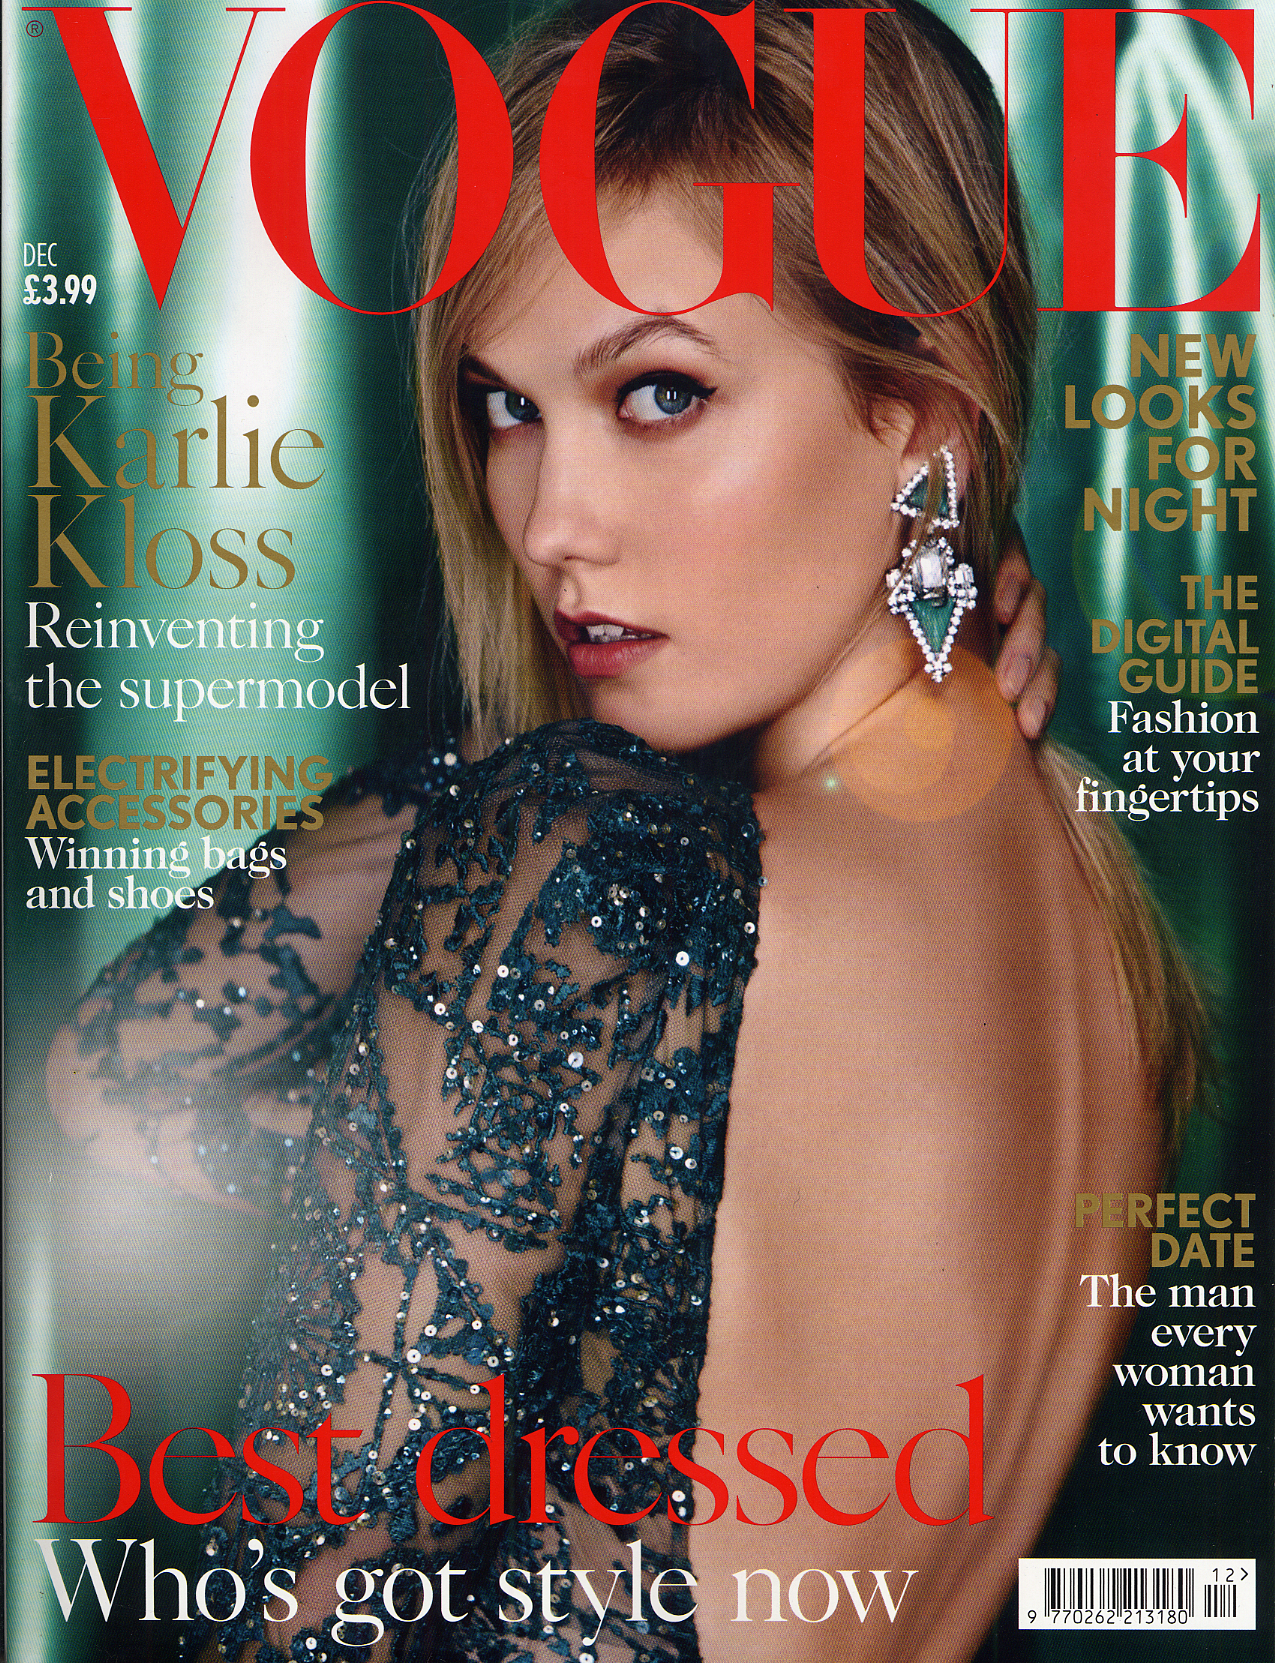 Vogue - December 2015